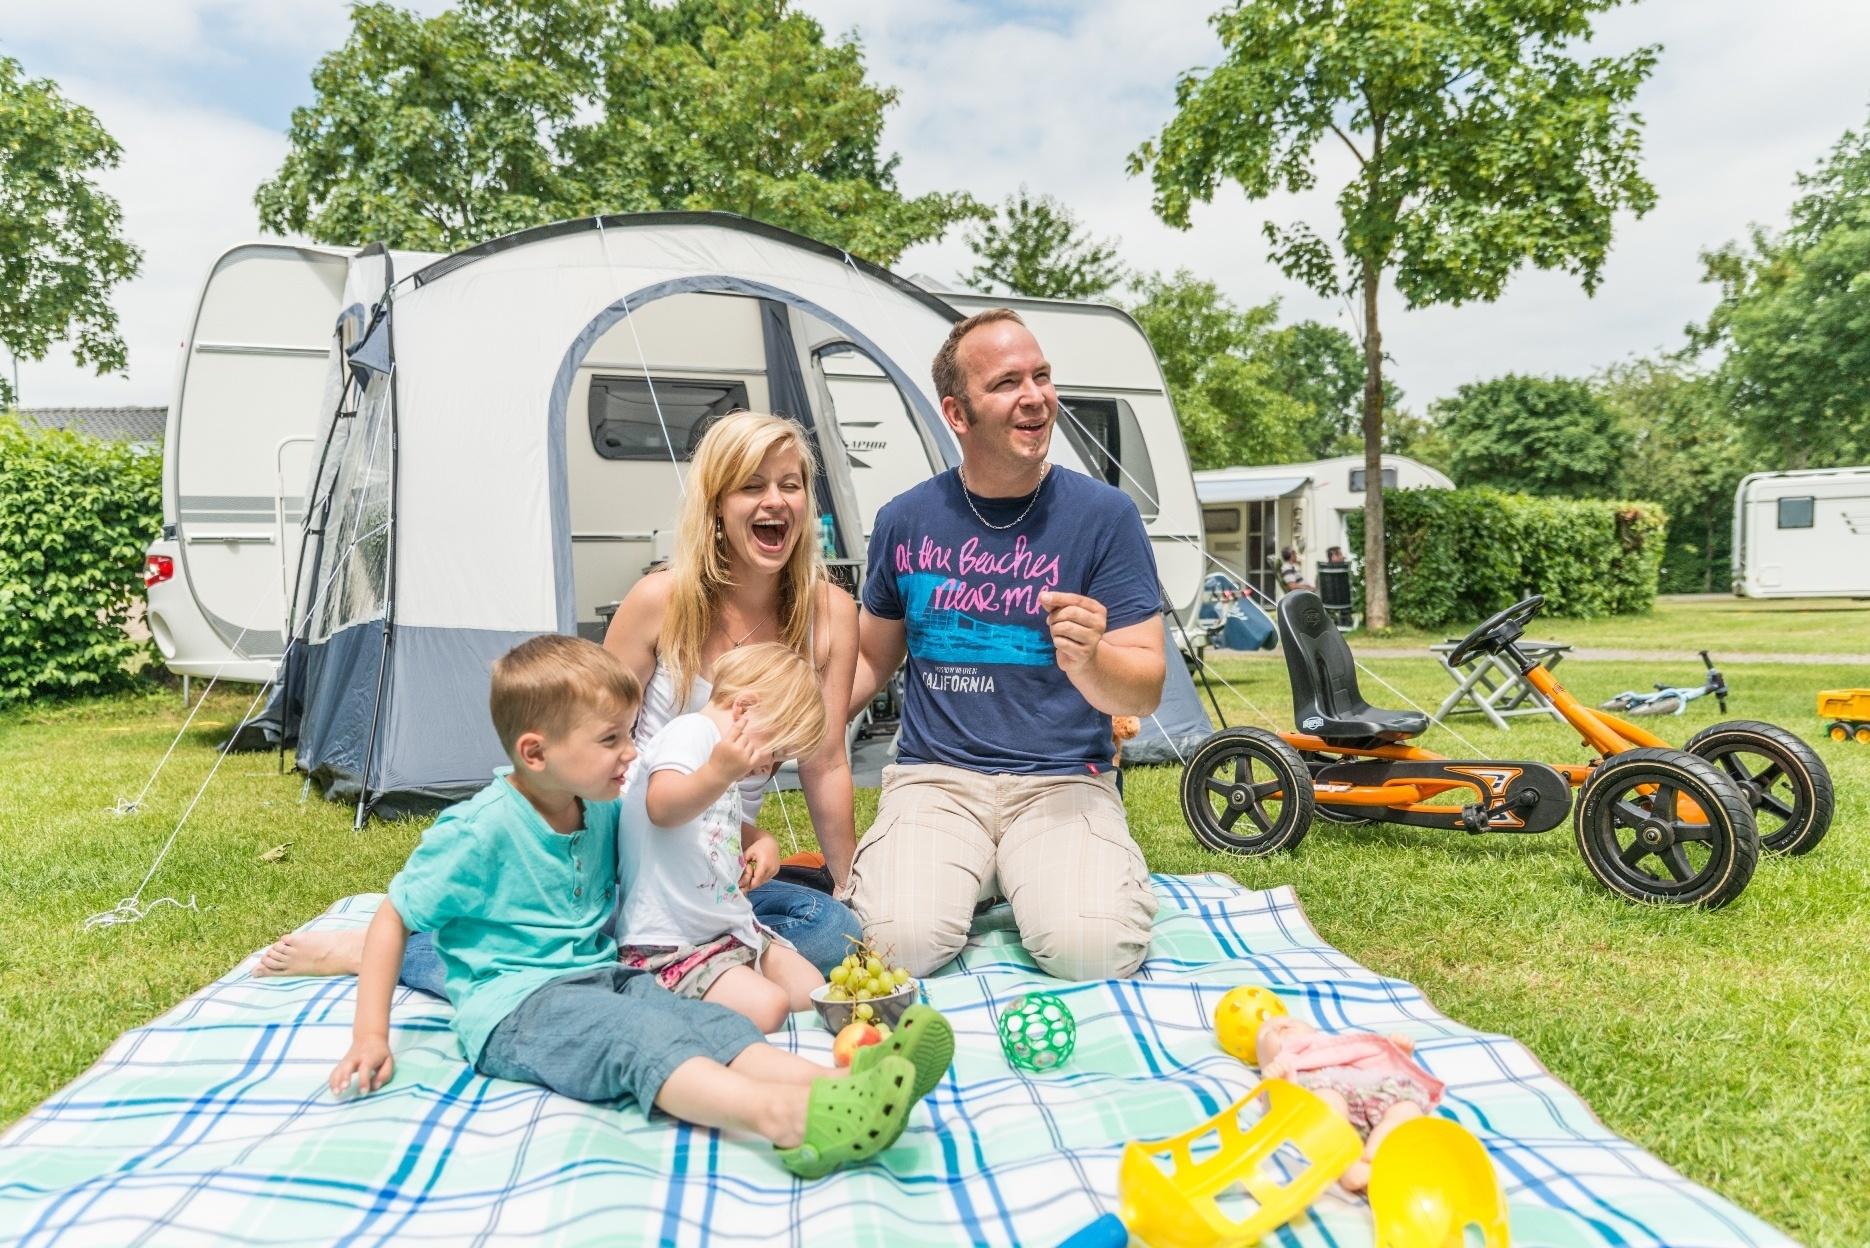 Duitsland-Rieste-Alfsee%20Ferien%20und%20Erlebnispark-ExtraLarge Campings Duitsland